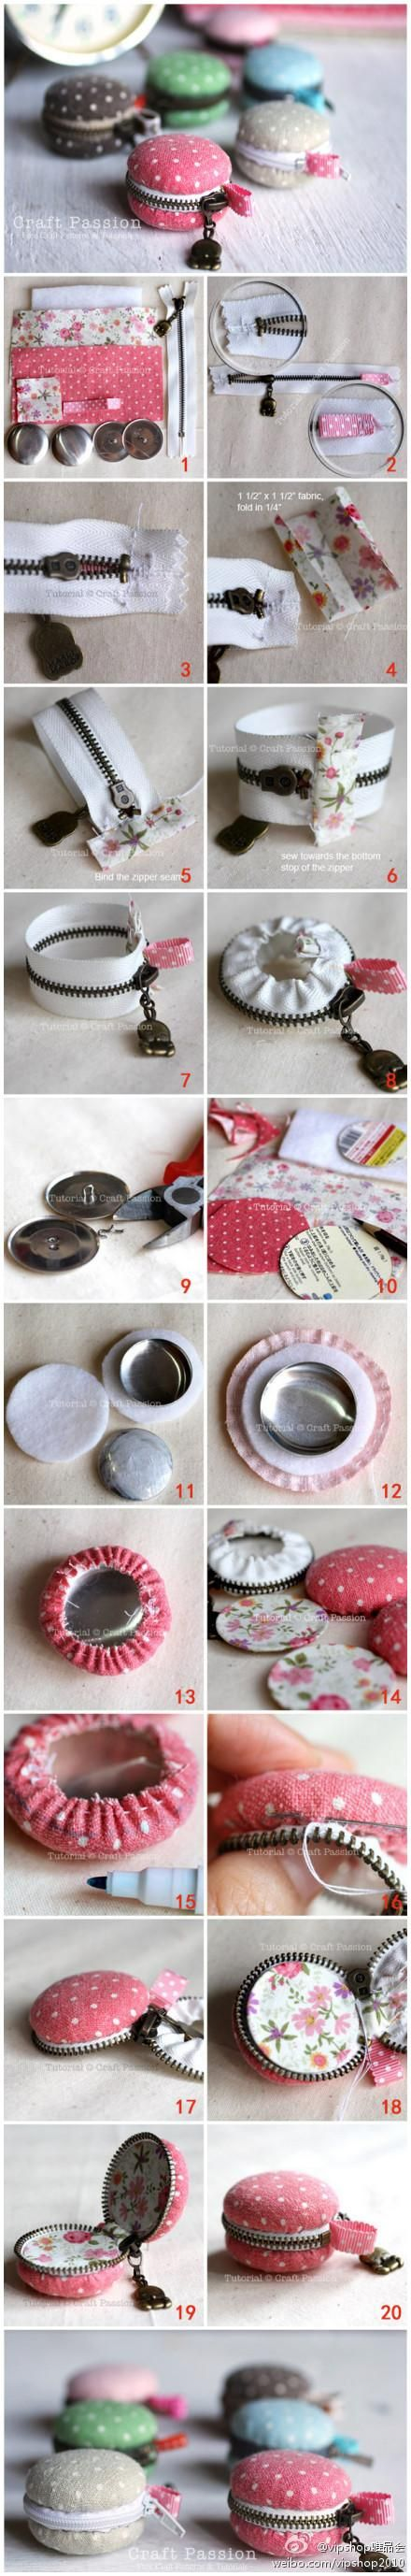 Macaron purses!                                                                                                                                                                                 More